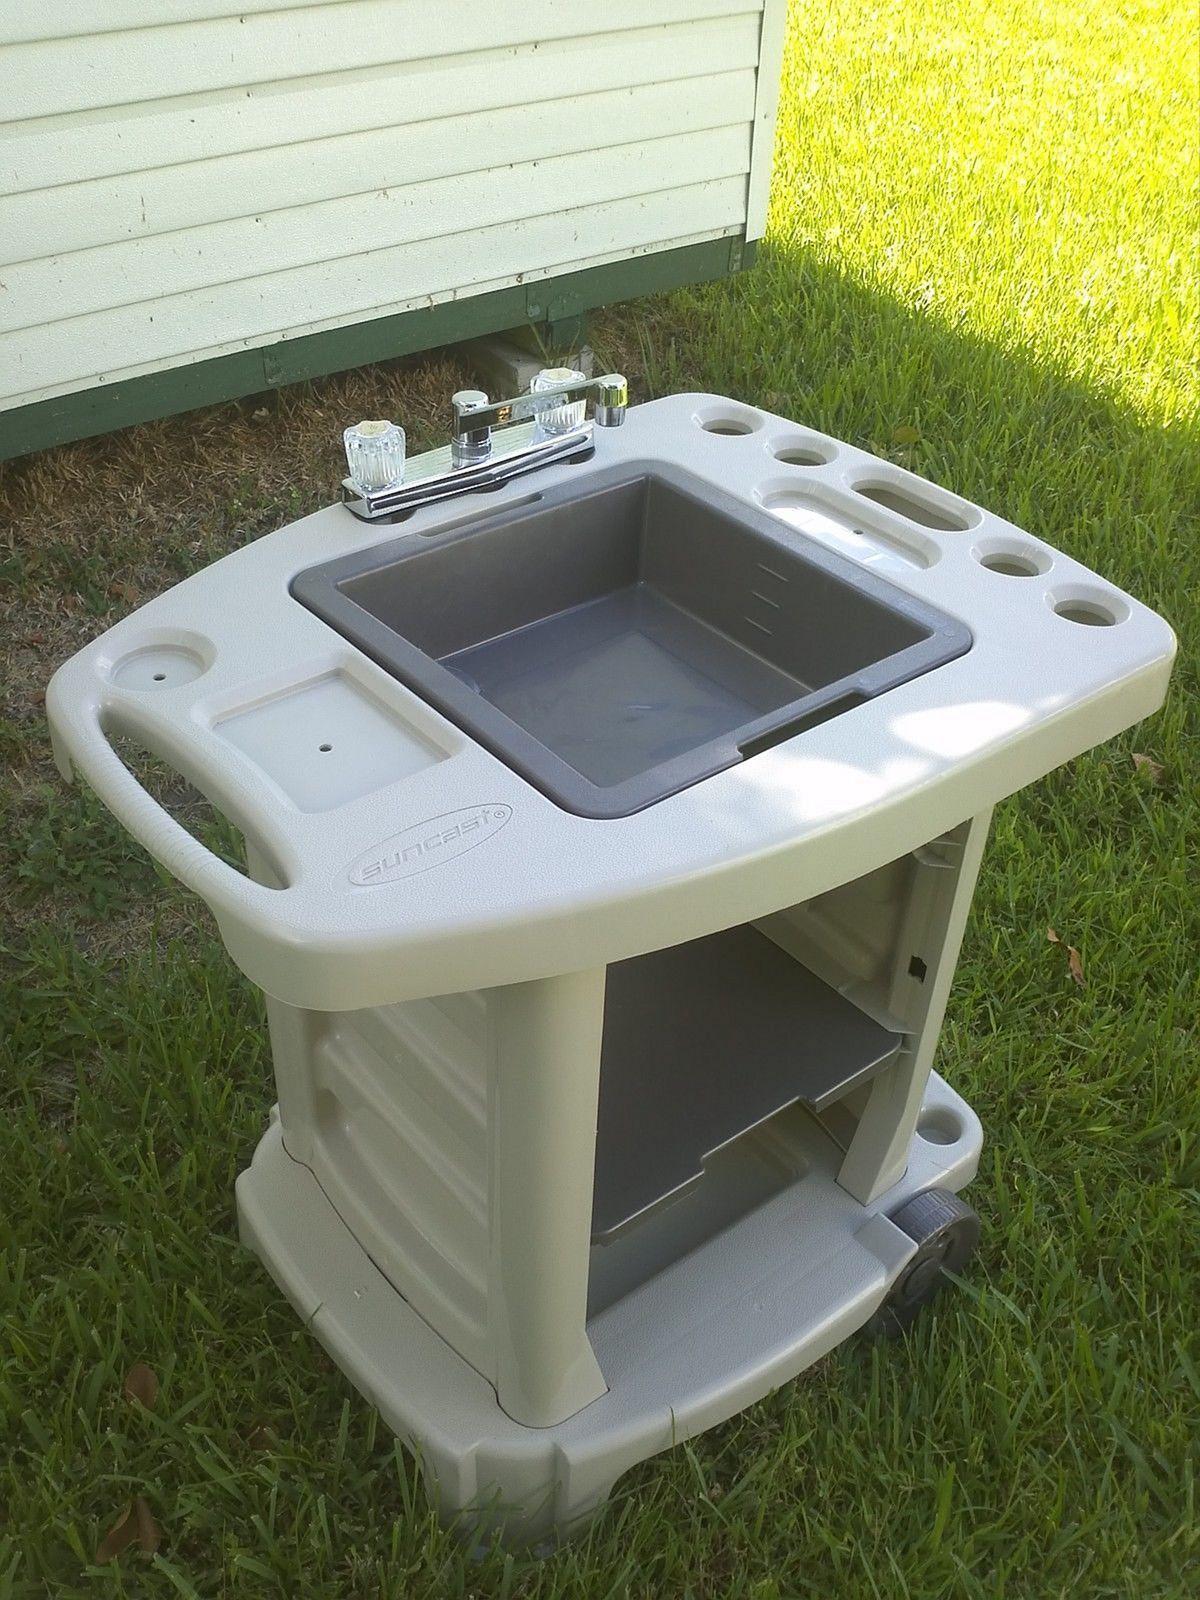 23 awesome rv kitchen sink design ideas for preparing your vacation outdoor kitchen sink on kitchen sink ideas id=97705